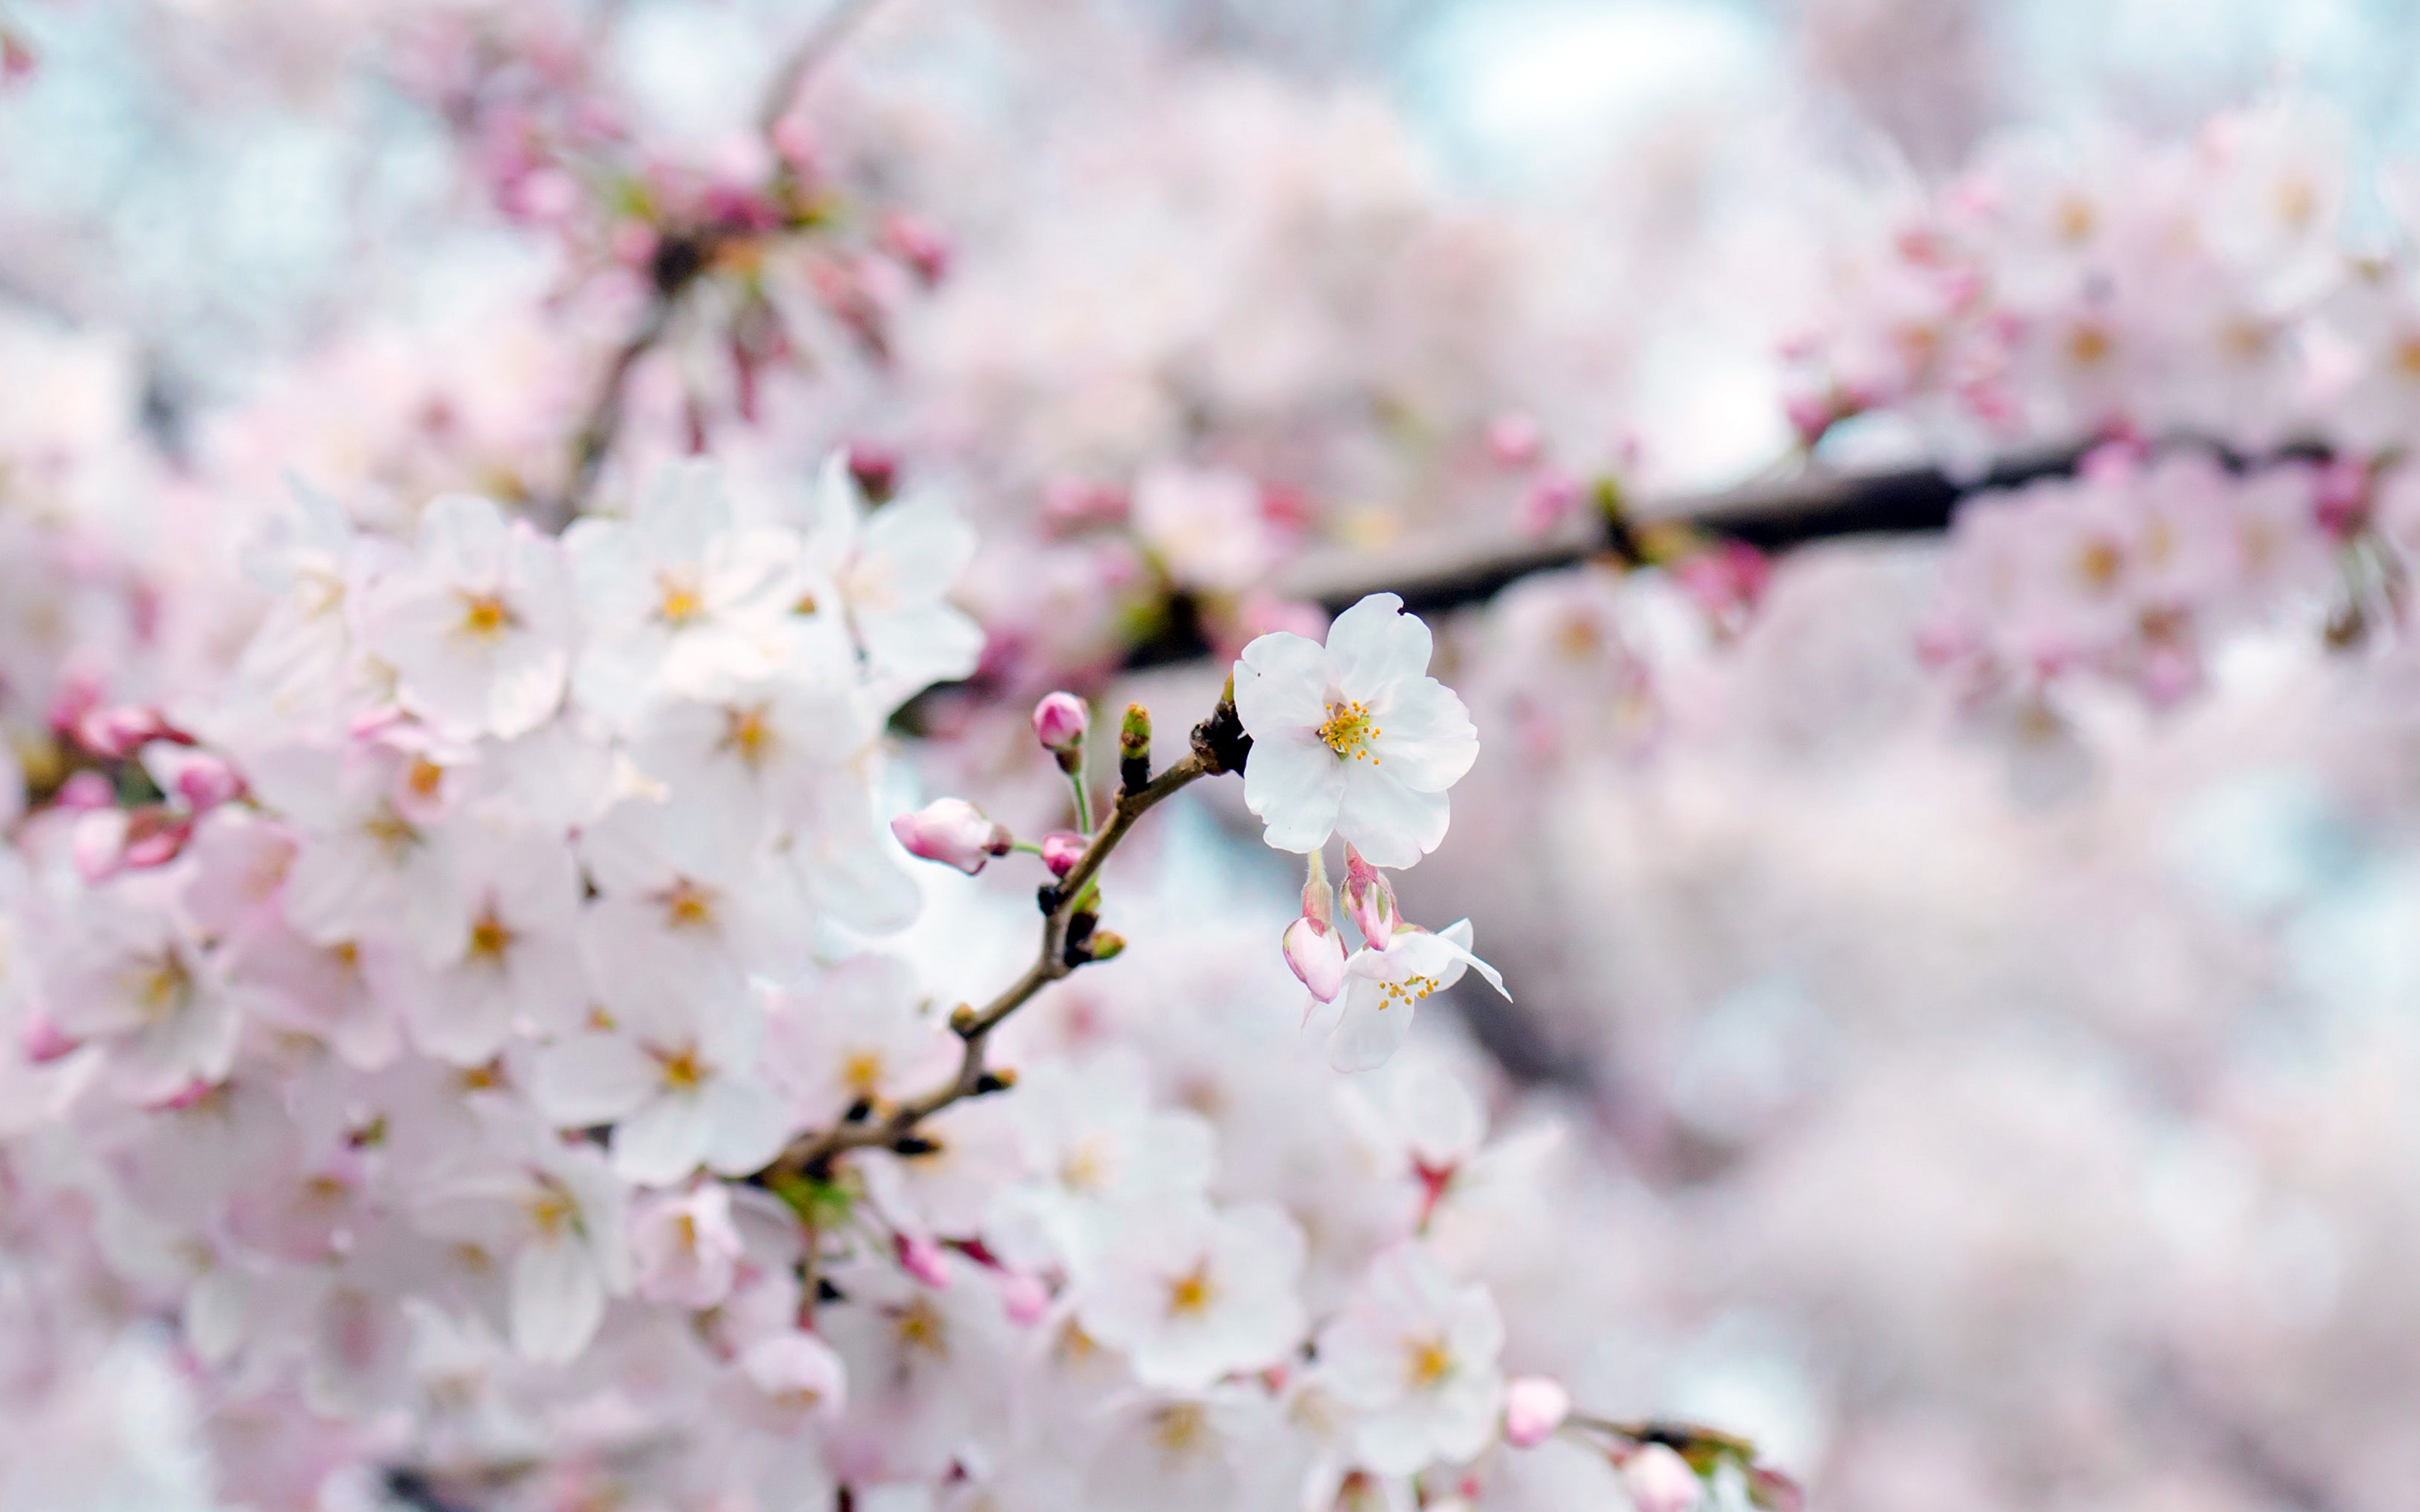 nx70-cherry-blossom-flower-spring-tree-bokeh-nature-wallpaper